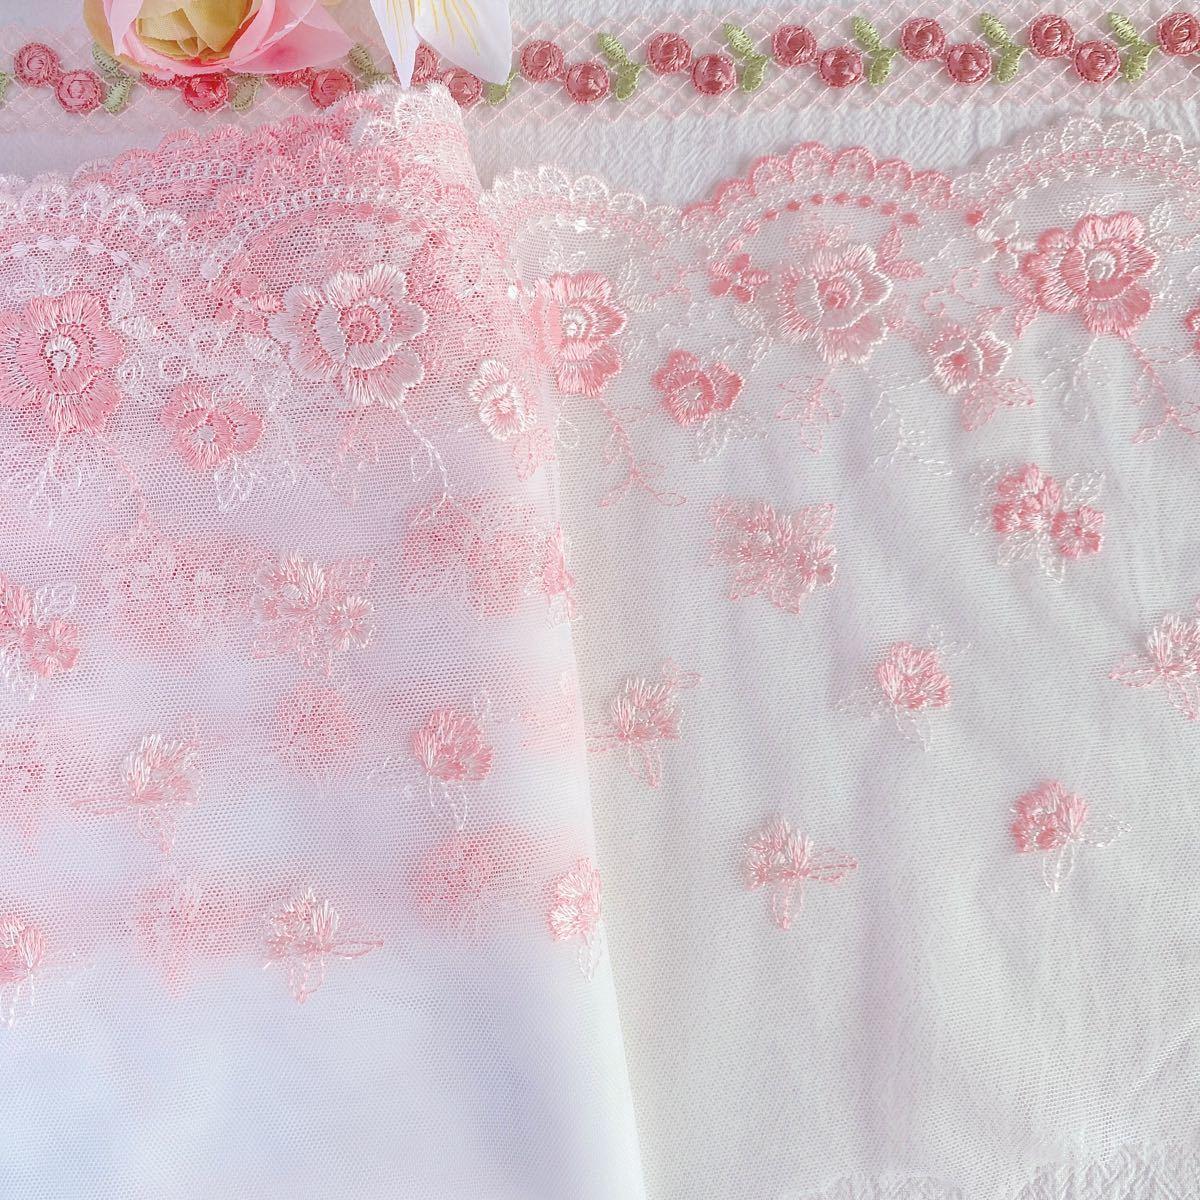 No.144 チュールレース 刺繍レース生地 ピンク 2m